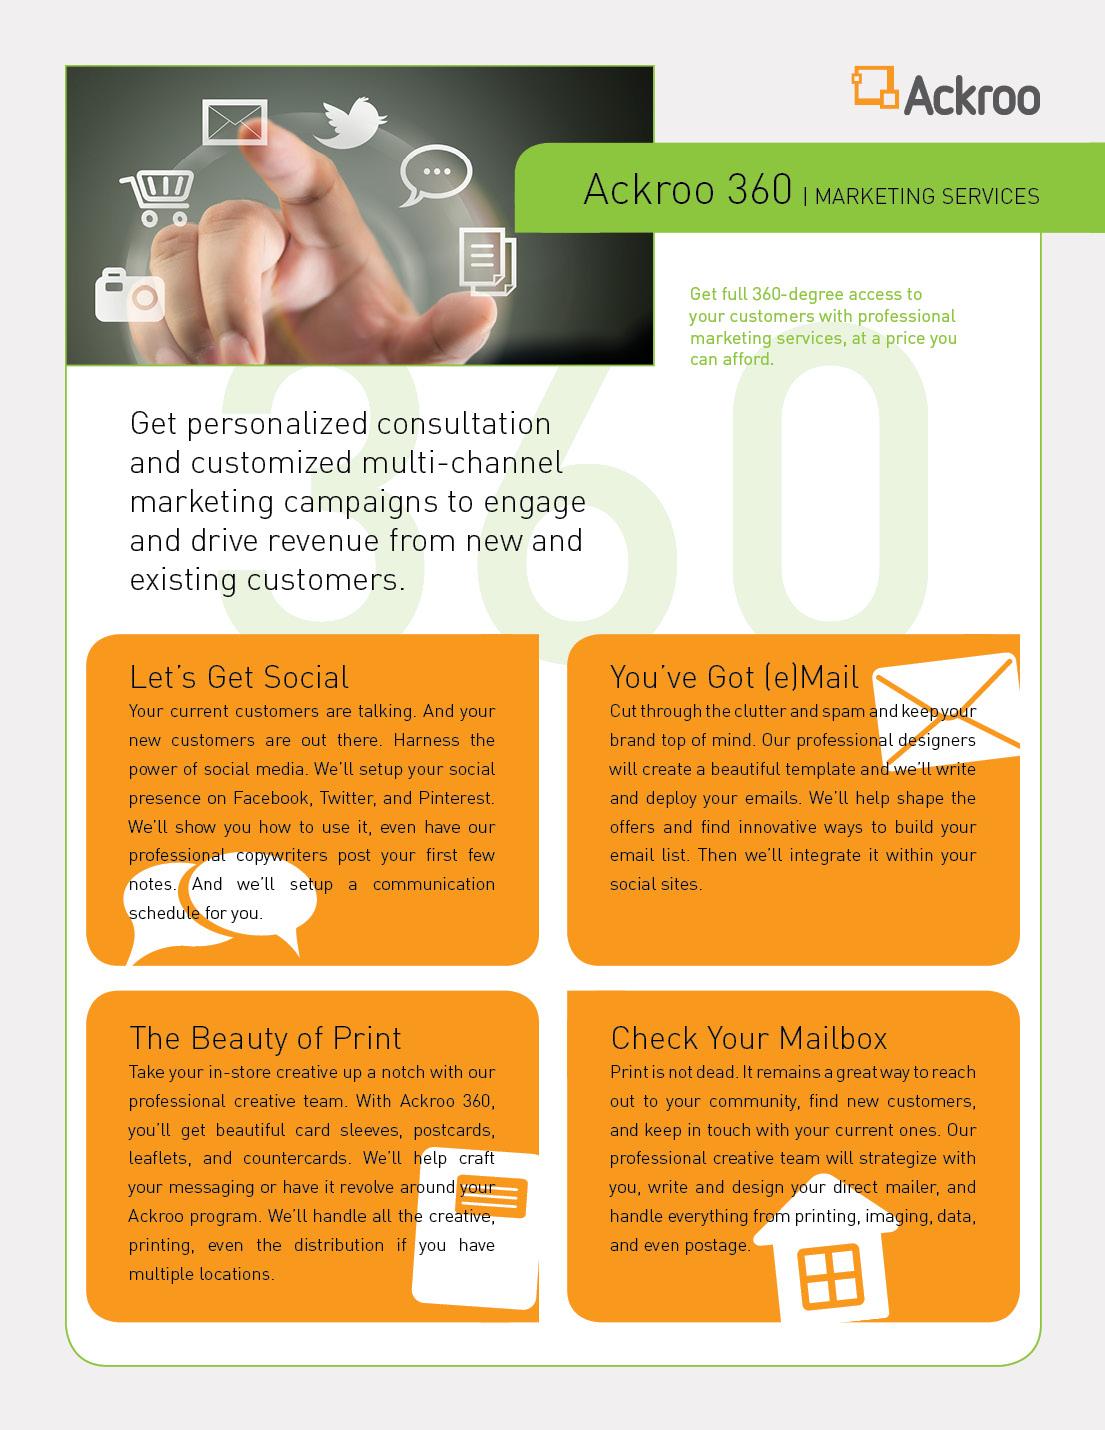 Ackroo 360 marketing services.jpg